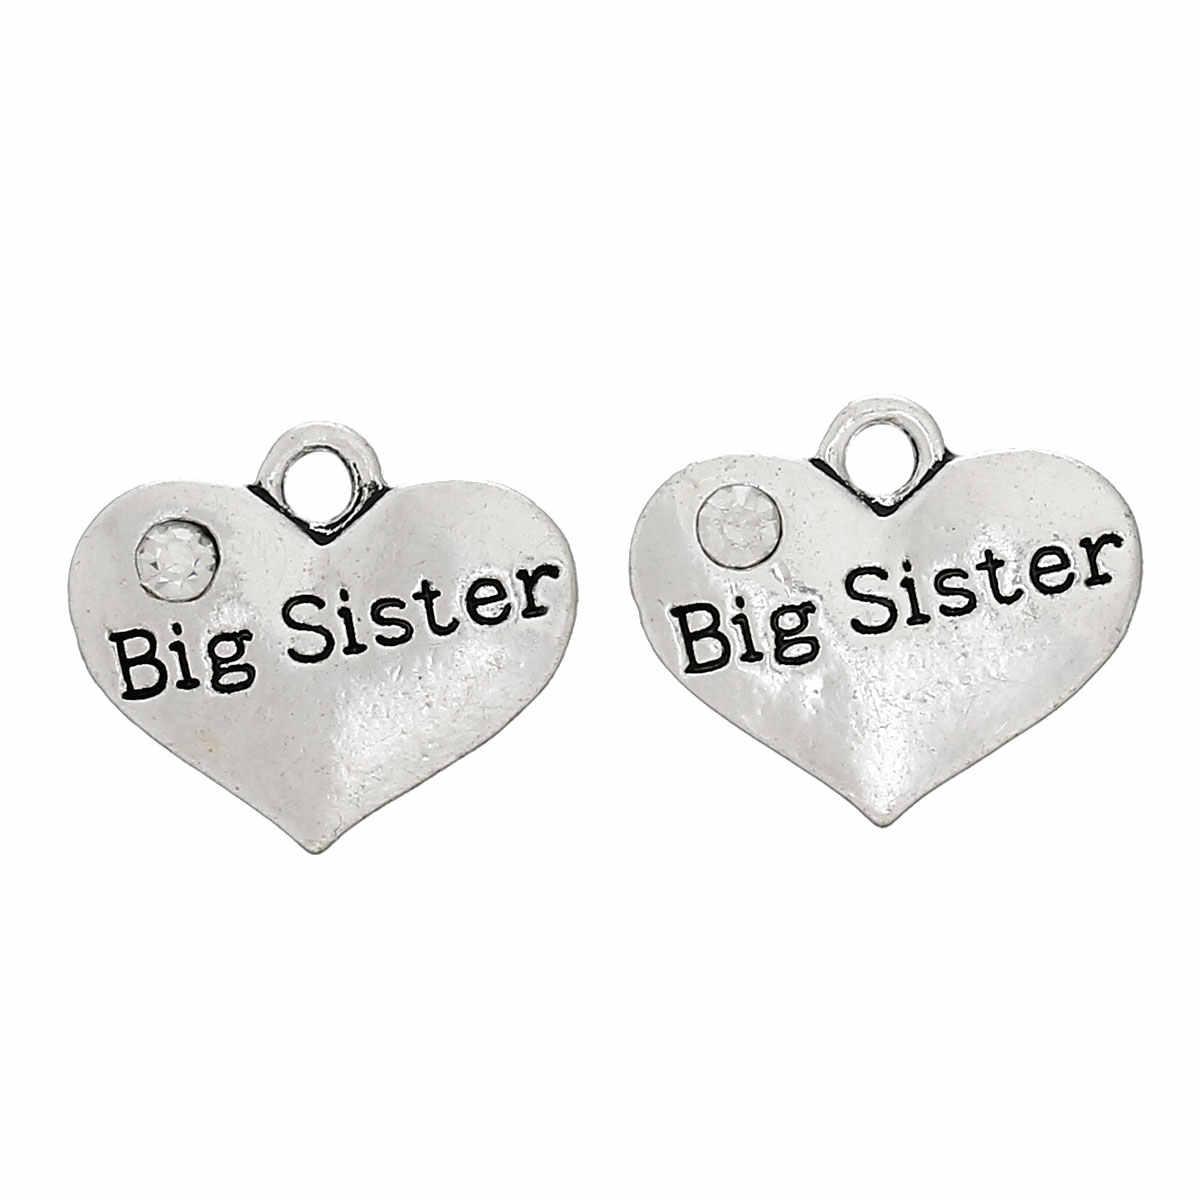 "Zinc Metal Alloy Charm Pendants Heart Antique Silver Message"" Big Sister "" Clear Rhinestone 17mmx14mm,2 PCs new"